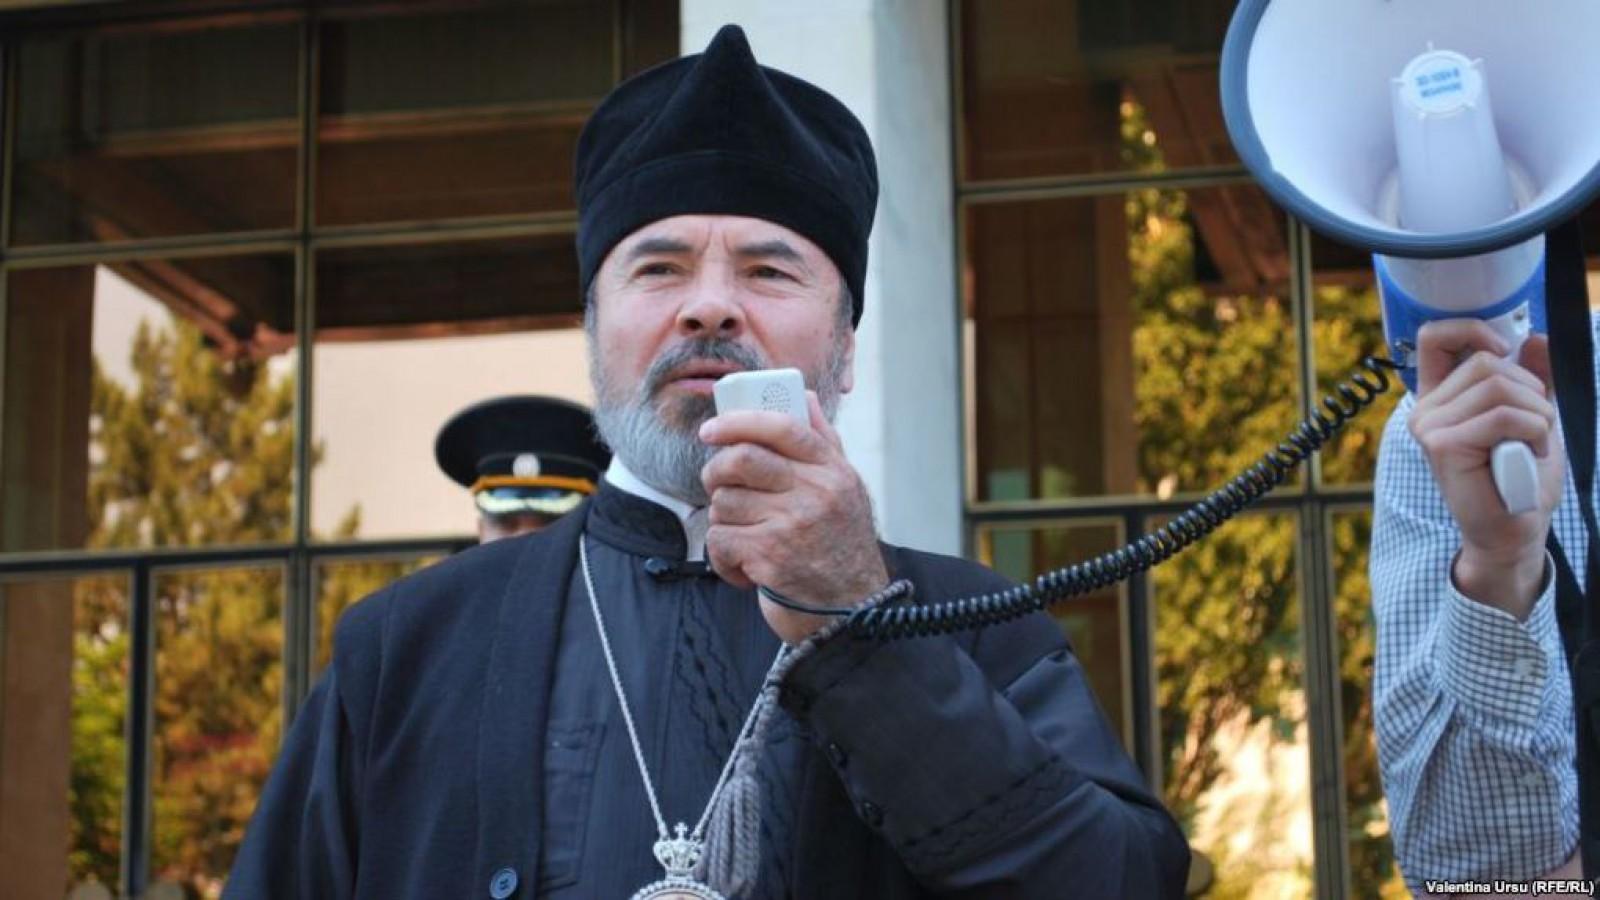 Anatol Moraru // Episcopul Marchel între religie, comunism și antiromânism